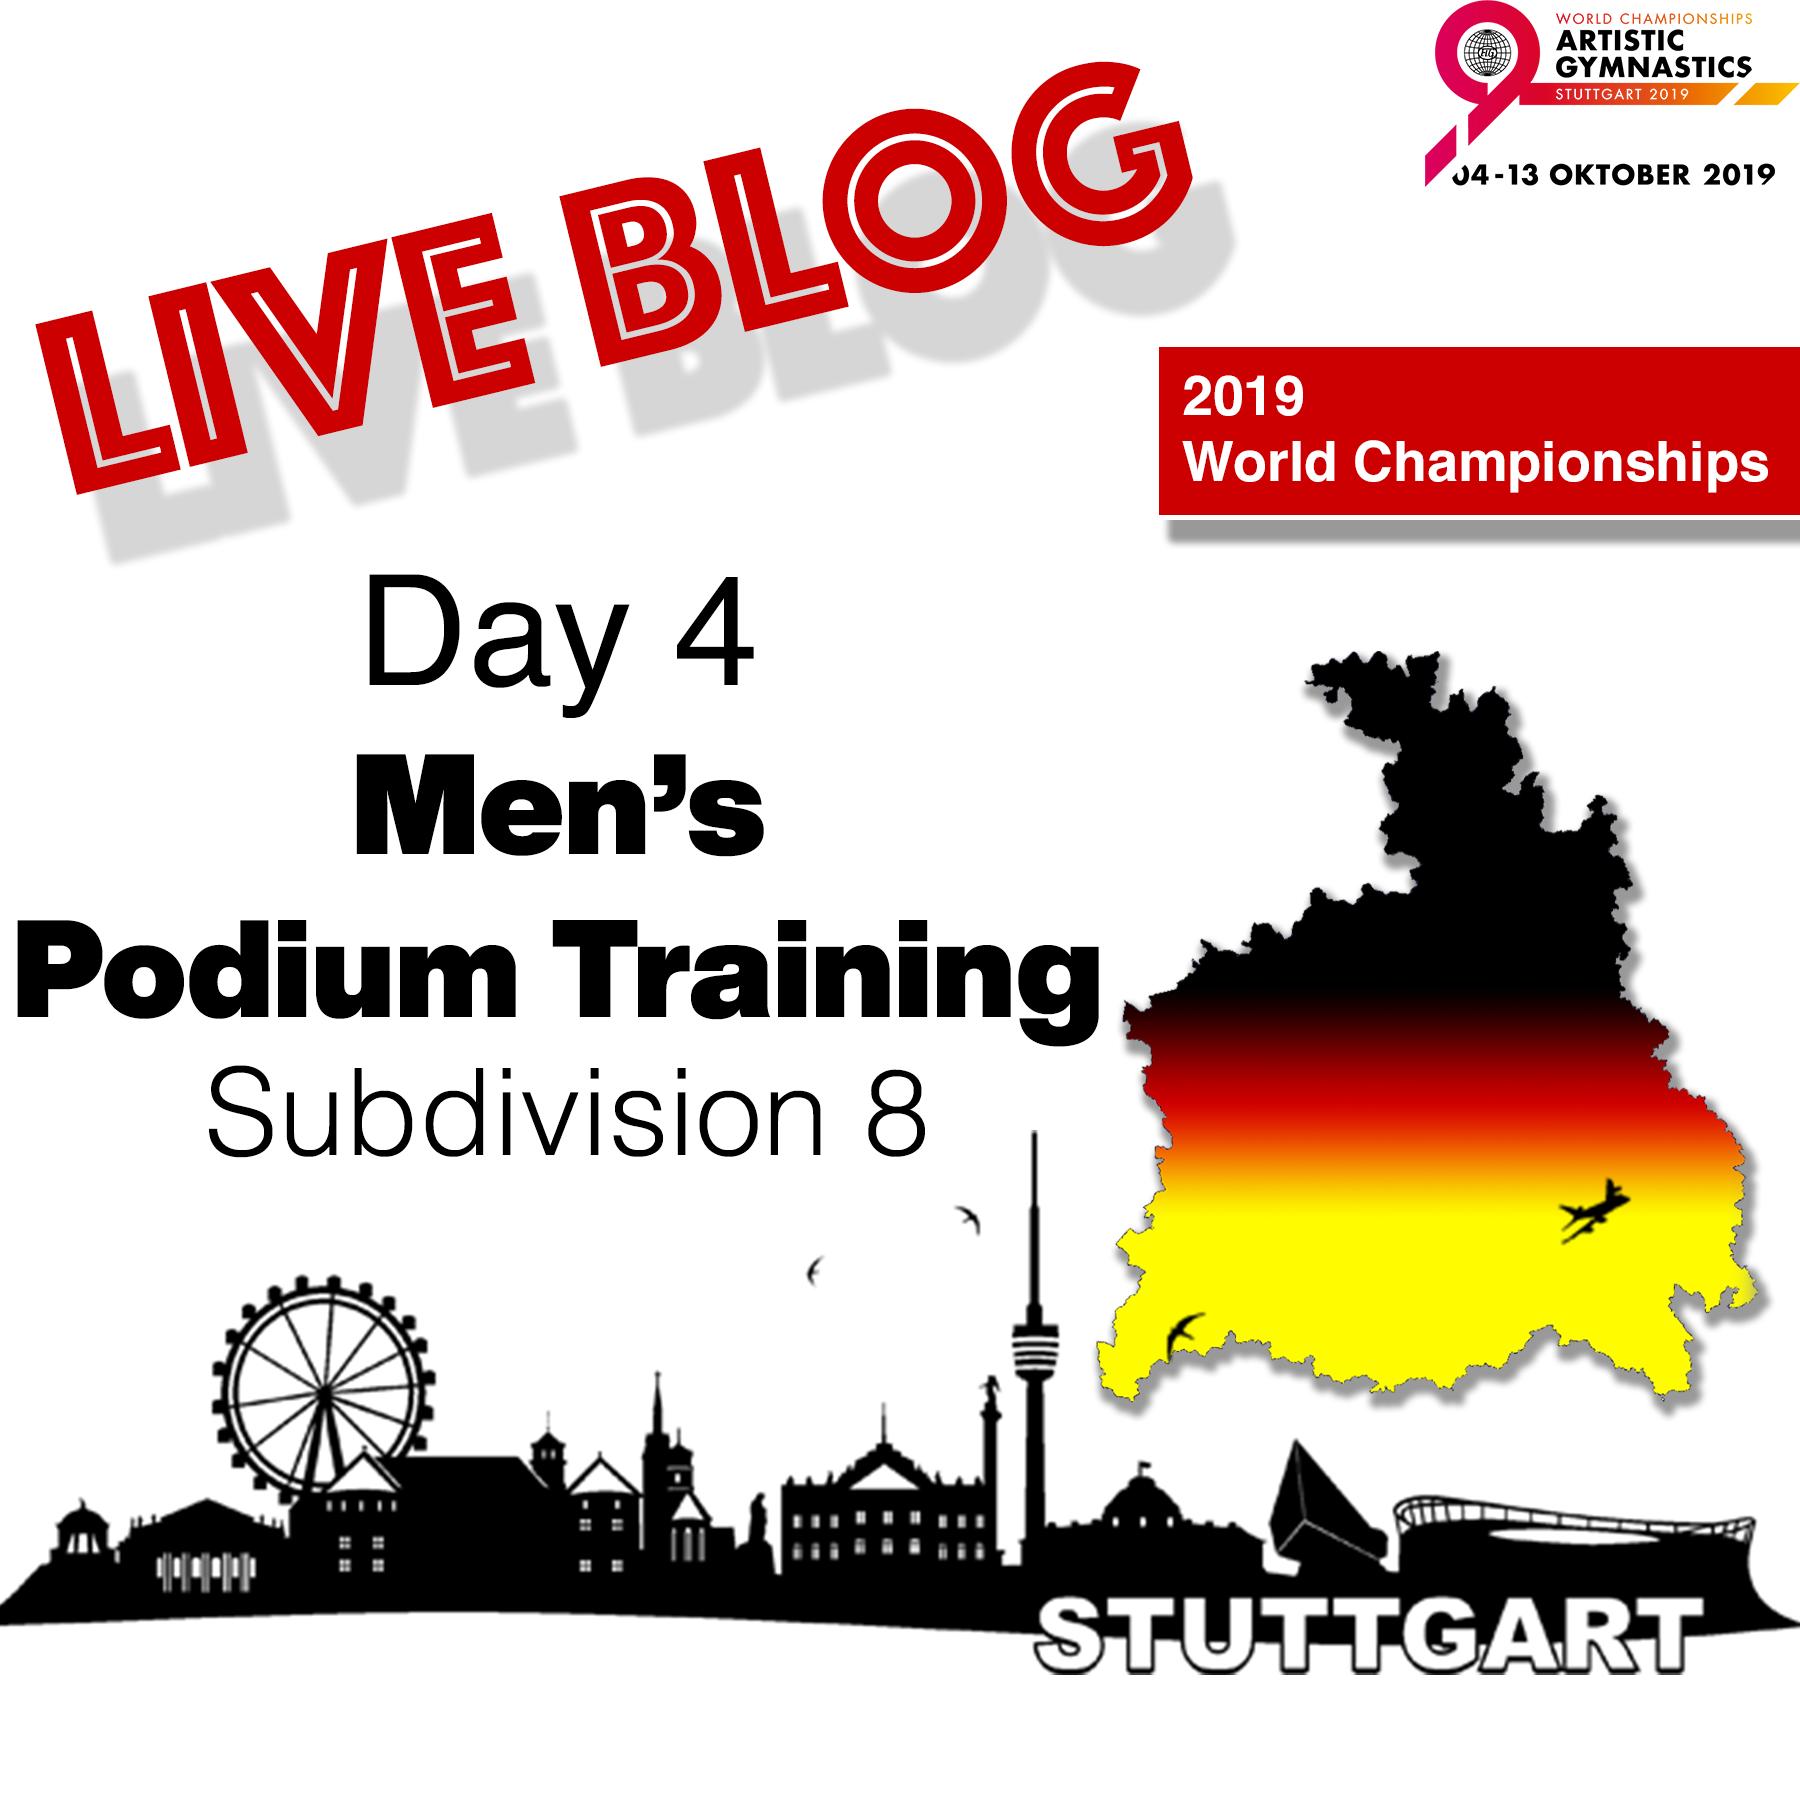 Live Blog: 2019 World Championships – MAG Podium Training – Sub Division 8, Oct. 3rd